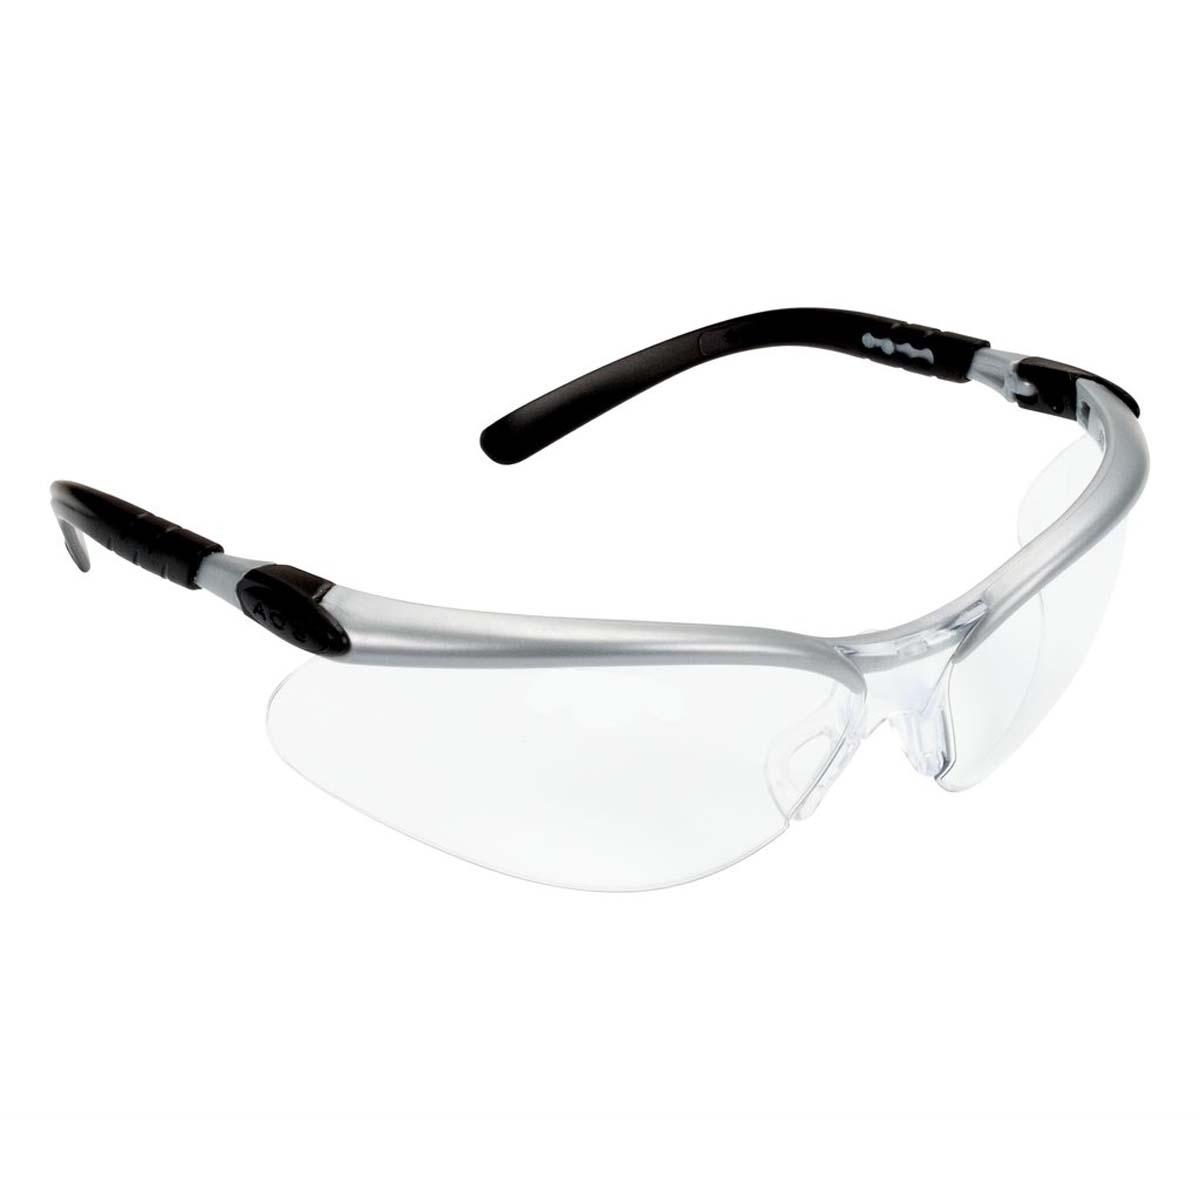 "3Mâ""¢ BXâ""¢ Protective Eyewear 11380-00000-20 Clear Anti-Fog Lens, Silver/Black Frame"